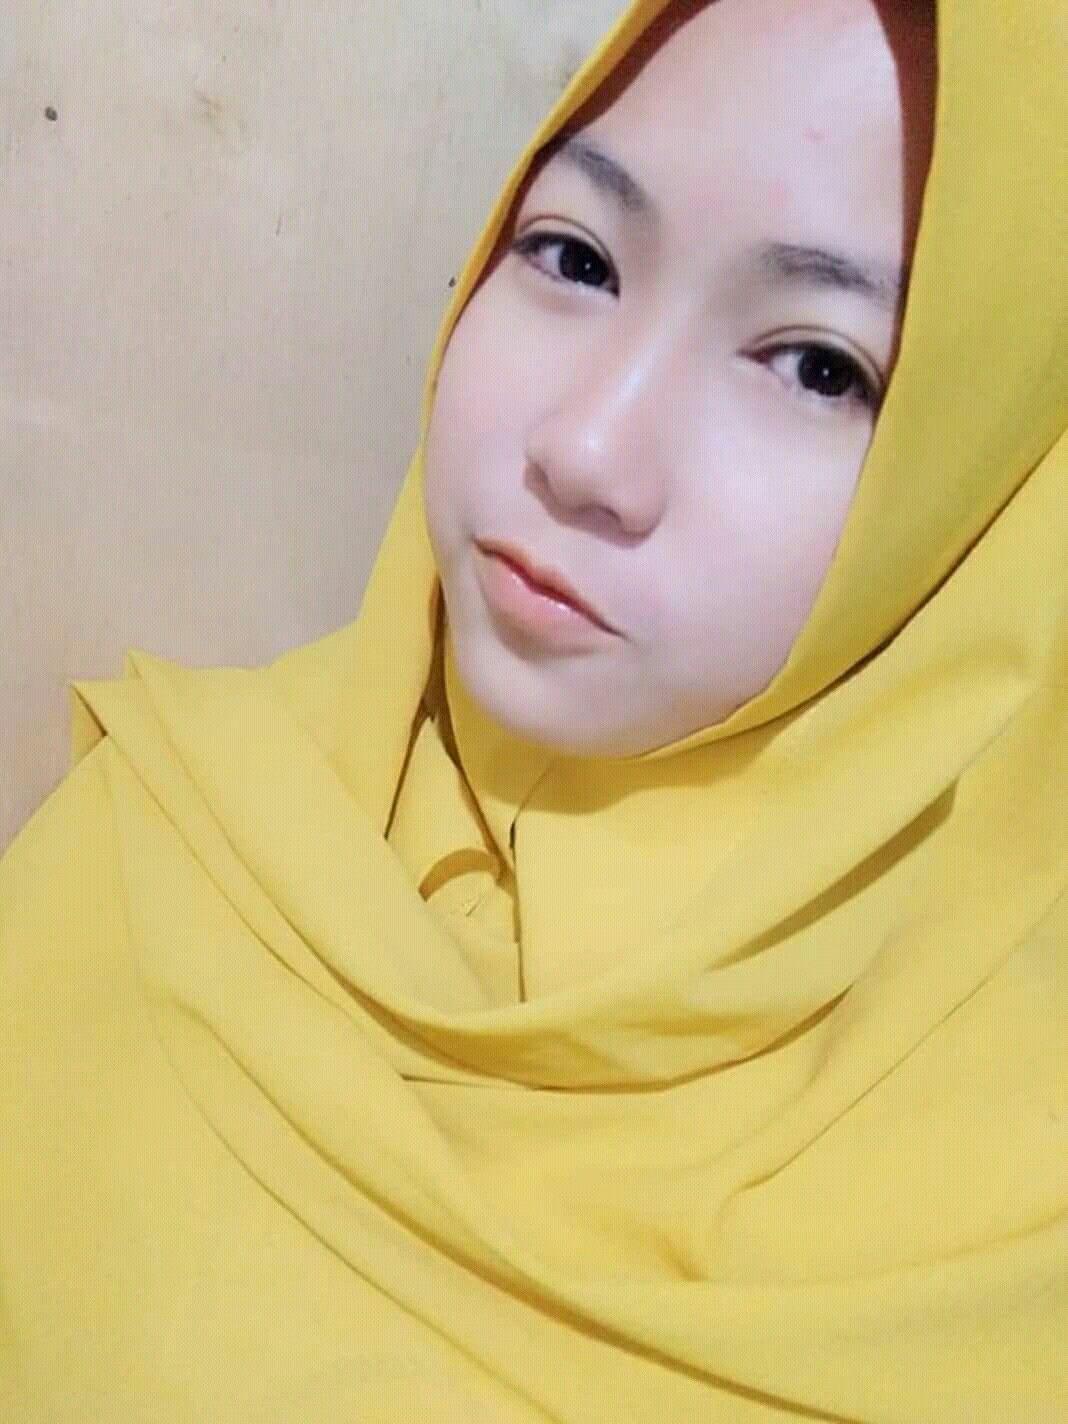 Pin oleh Memanjakan mata Pria di lokal hijab indonesian